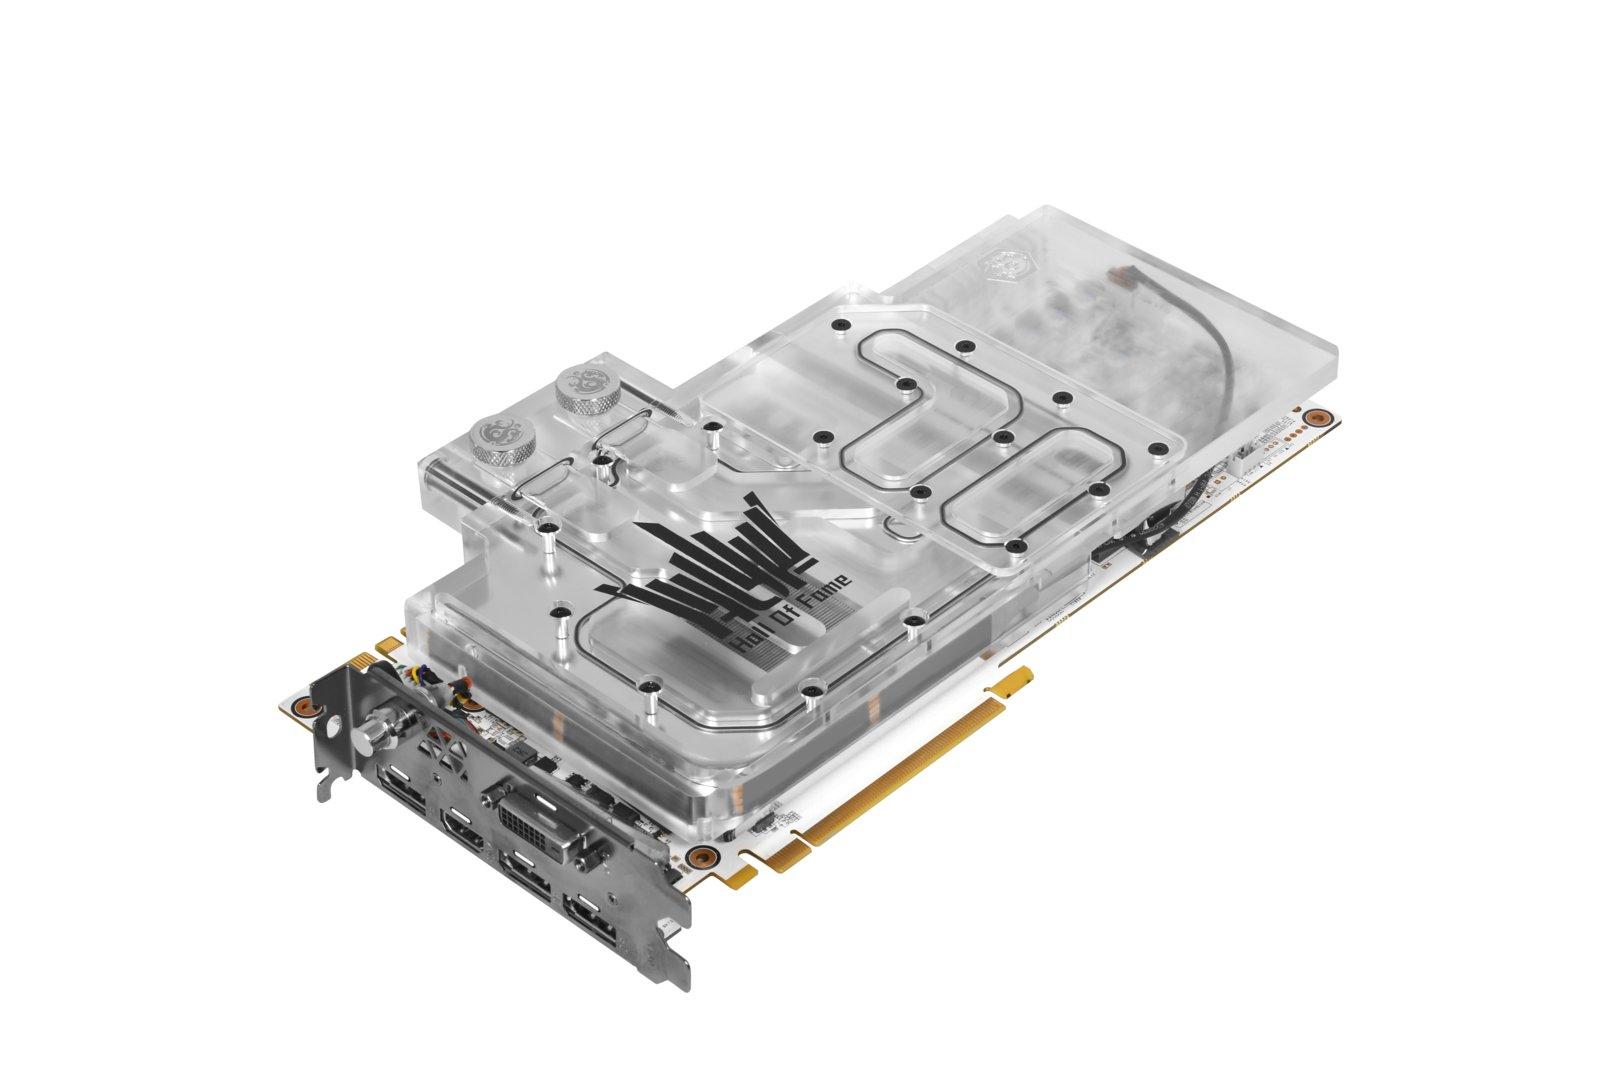 GeForce GTX 1080 Ti Hall of Fame Watercooled